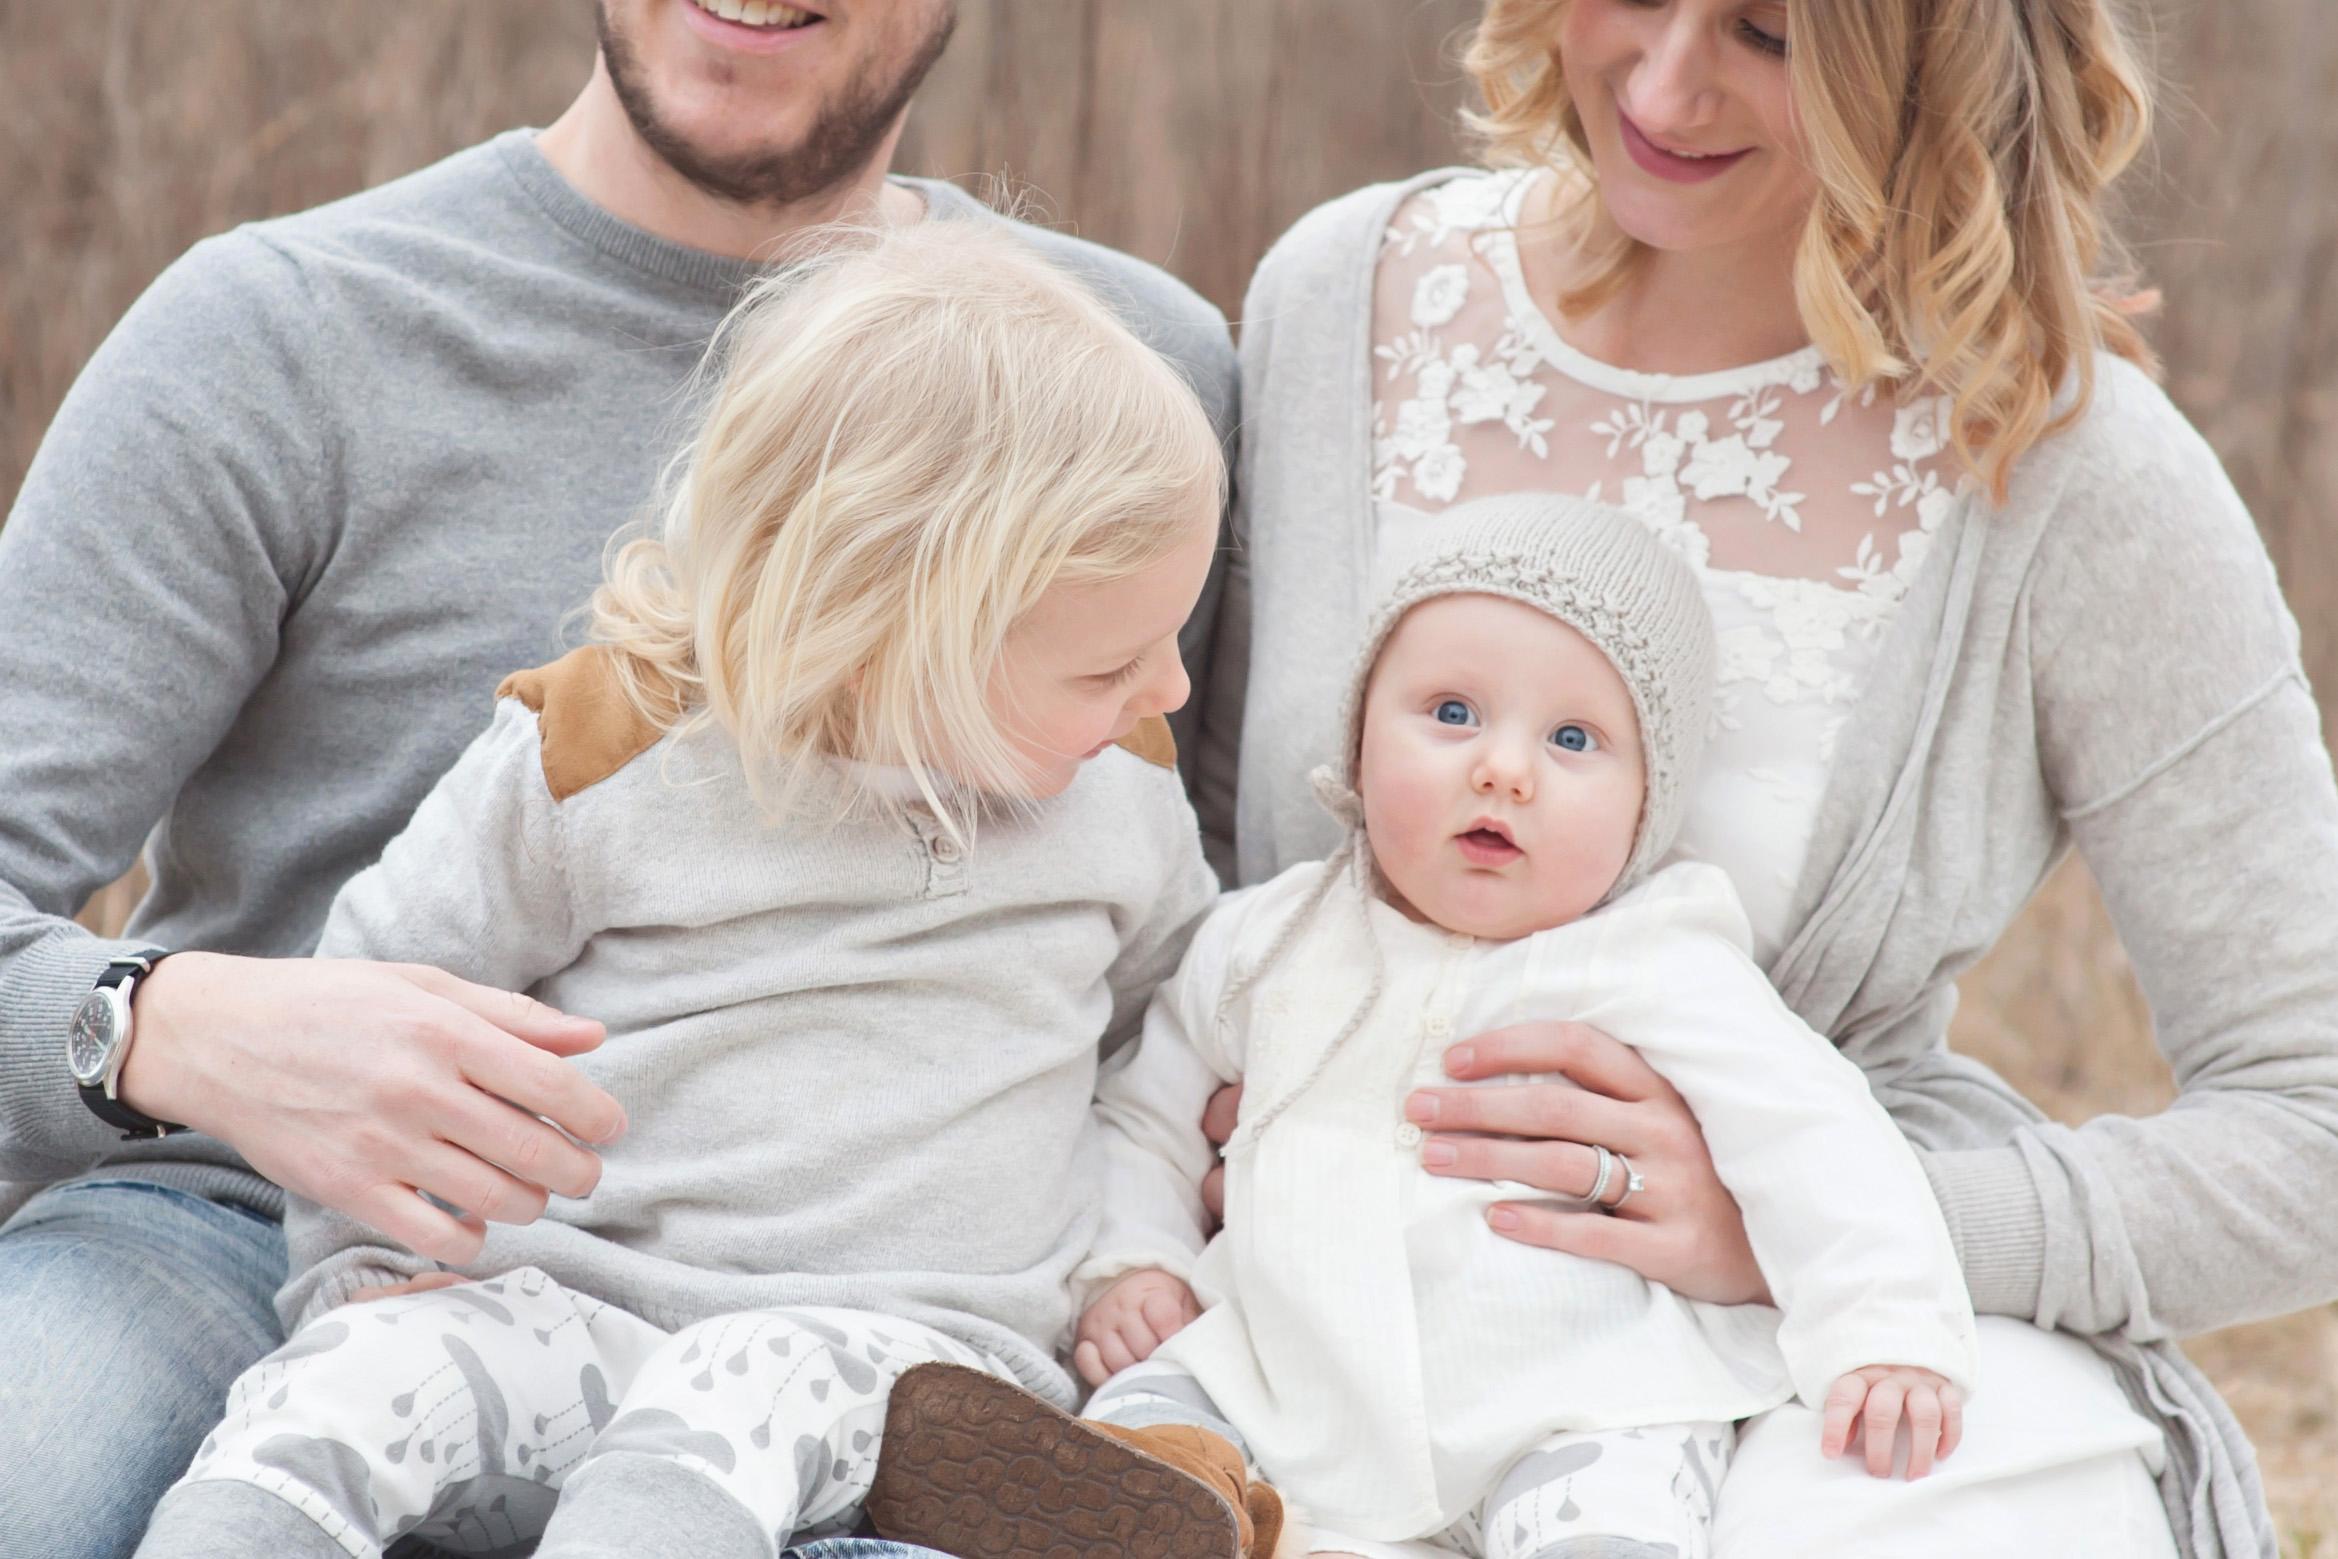 Best Louisville KY Family Photographer | Julie Brock Photography | Louisville KY Maternity Photographer | Louisville KY Newborn Photographer | Louisville KY Photographer | Louisville KY Baby Photographer | Field Photography Session Louisville KY